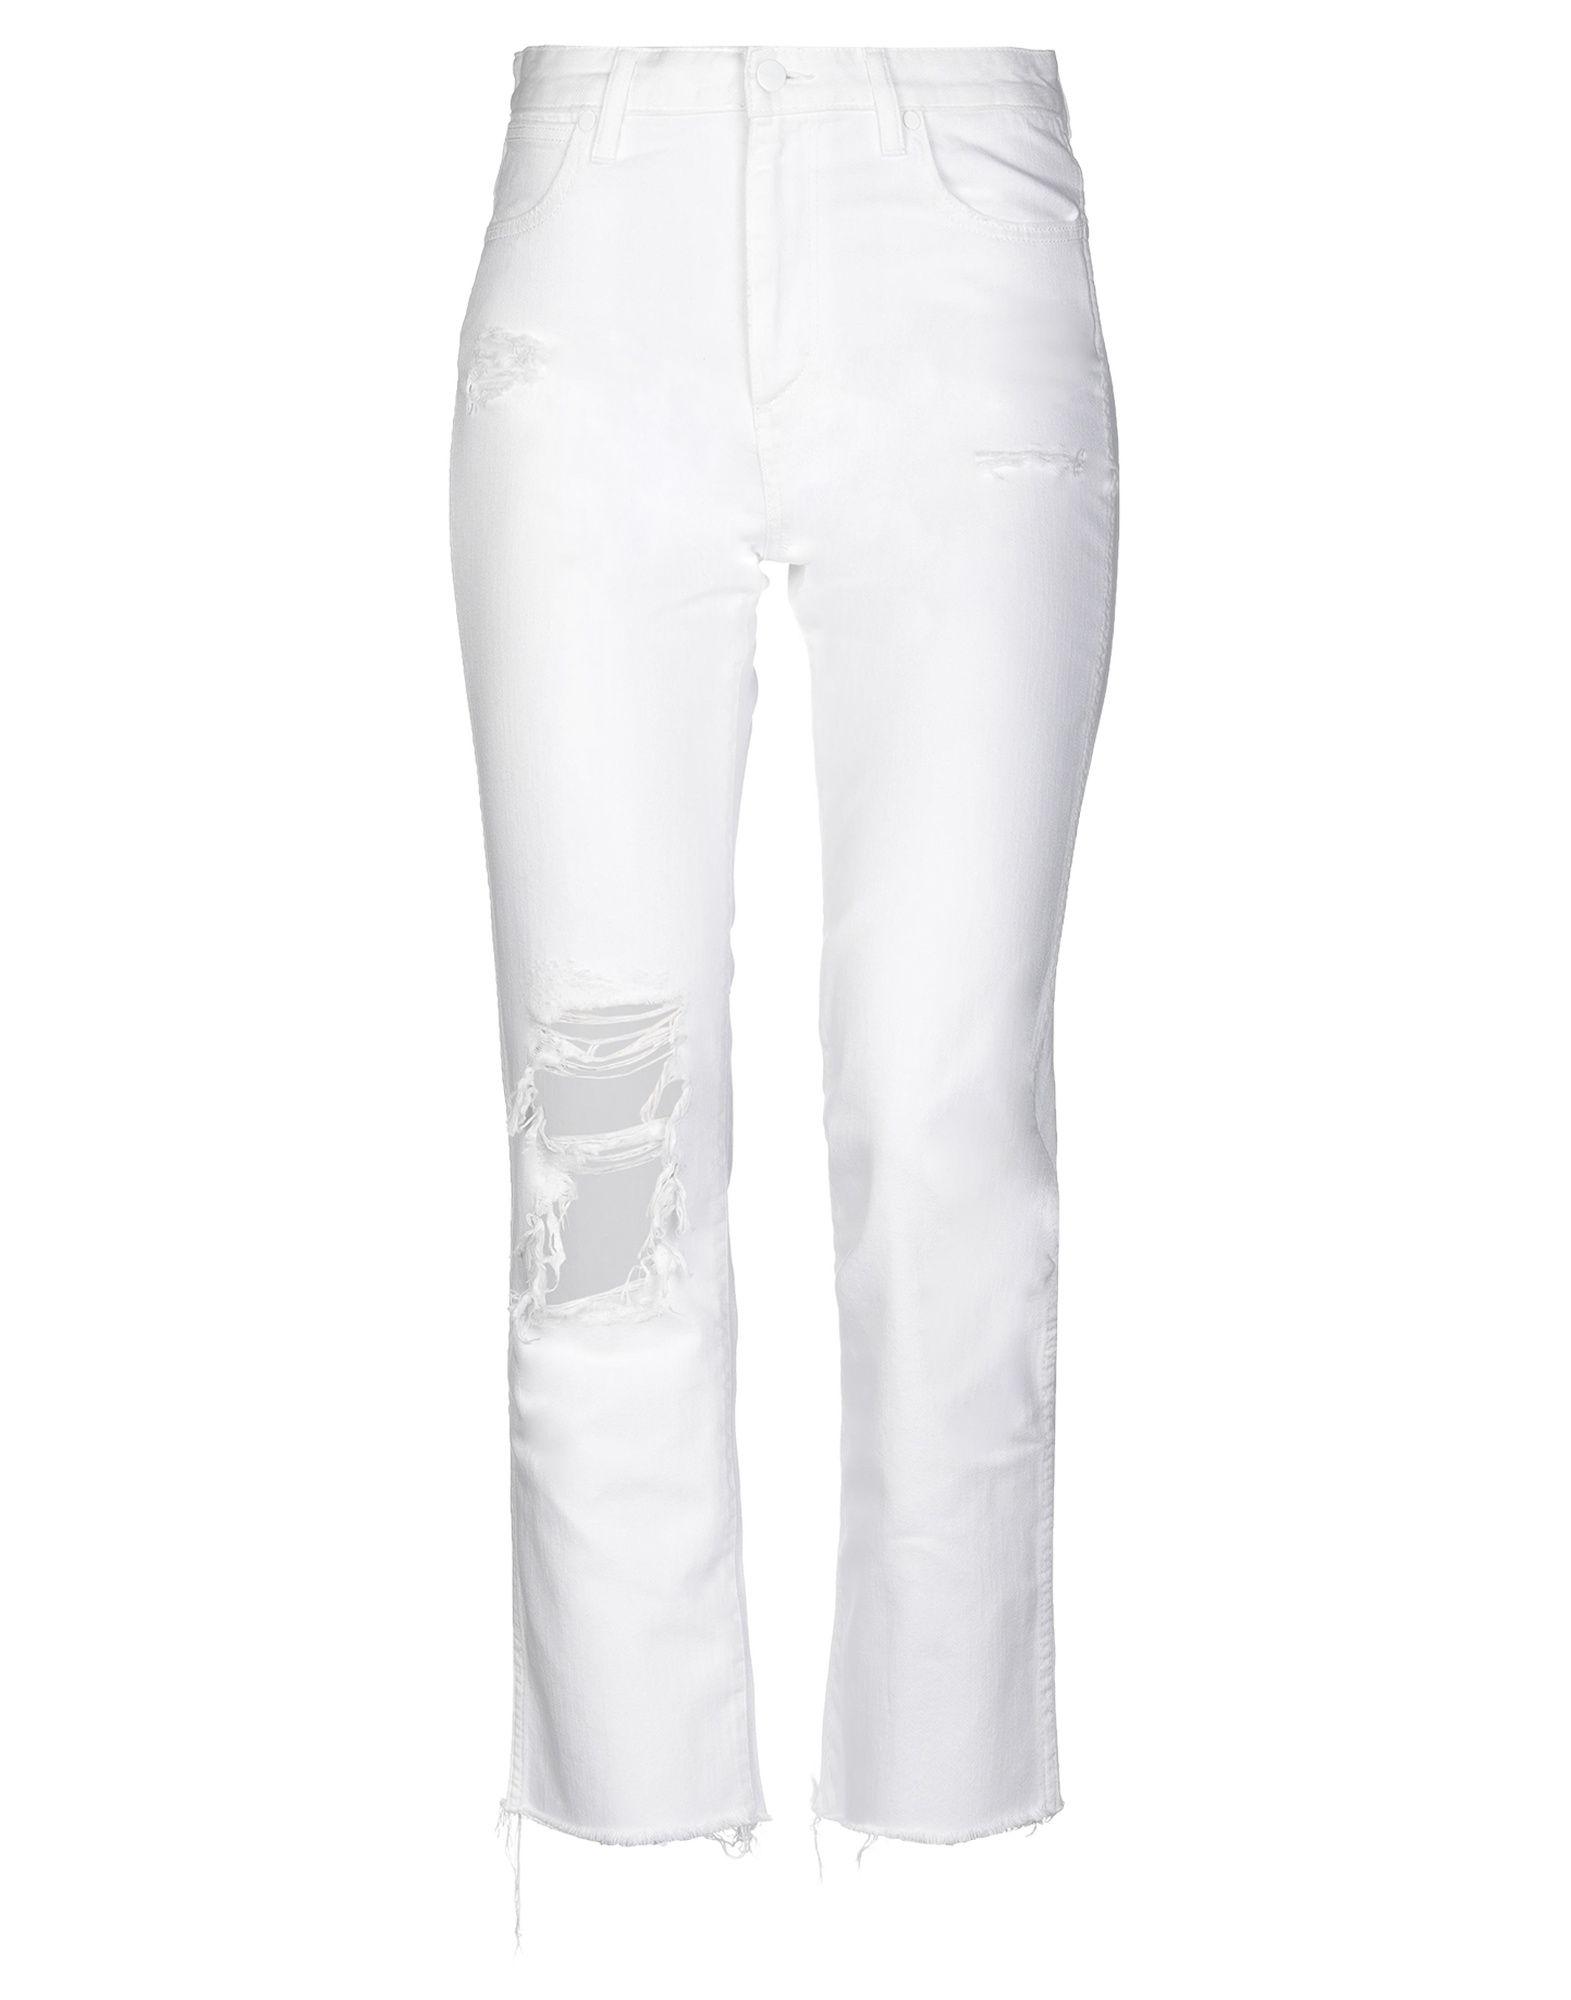 Pantaloni Jeans Wrangler donna - 42718625DR 42718625DR 42718625DR 989